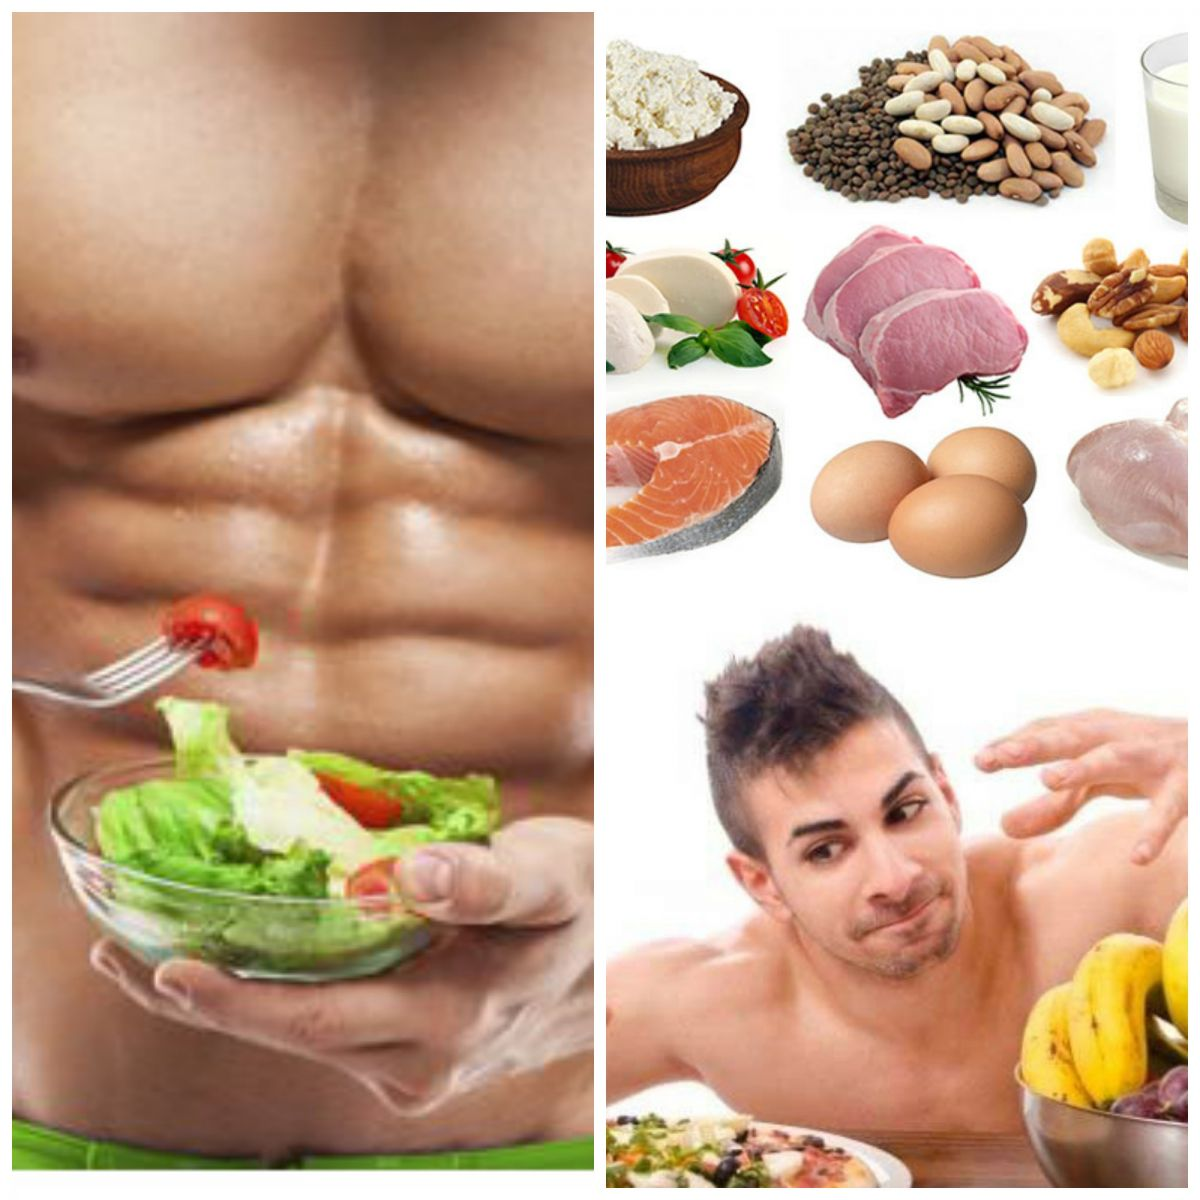 18-thuc-pham-giau-protein-cho-nguoi-tap-the-hinh-giam-can